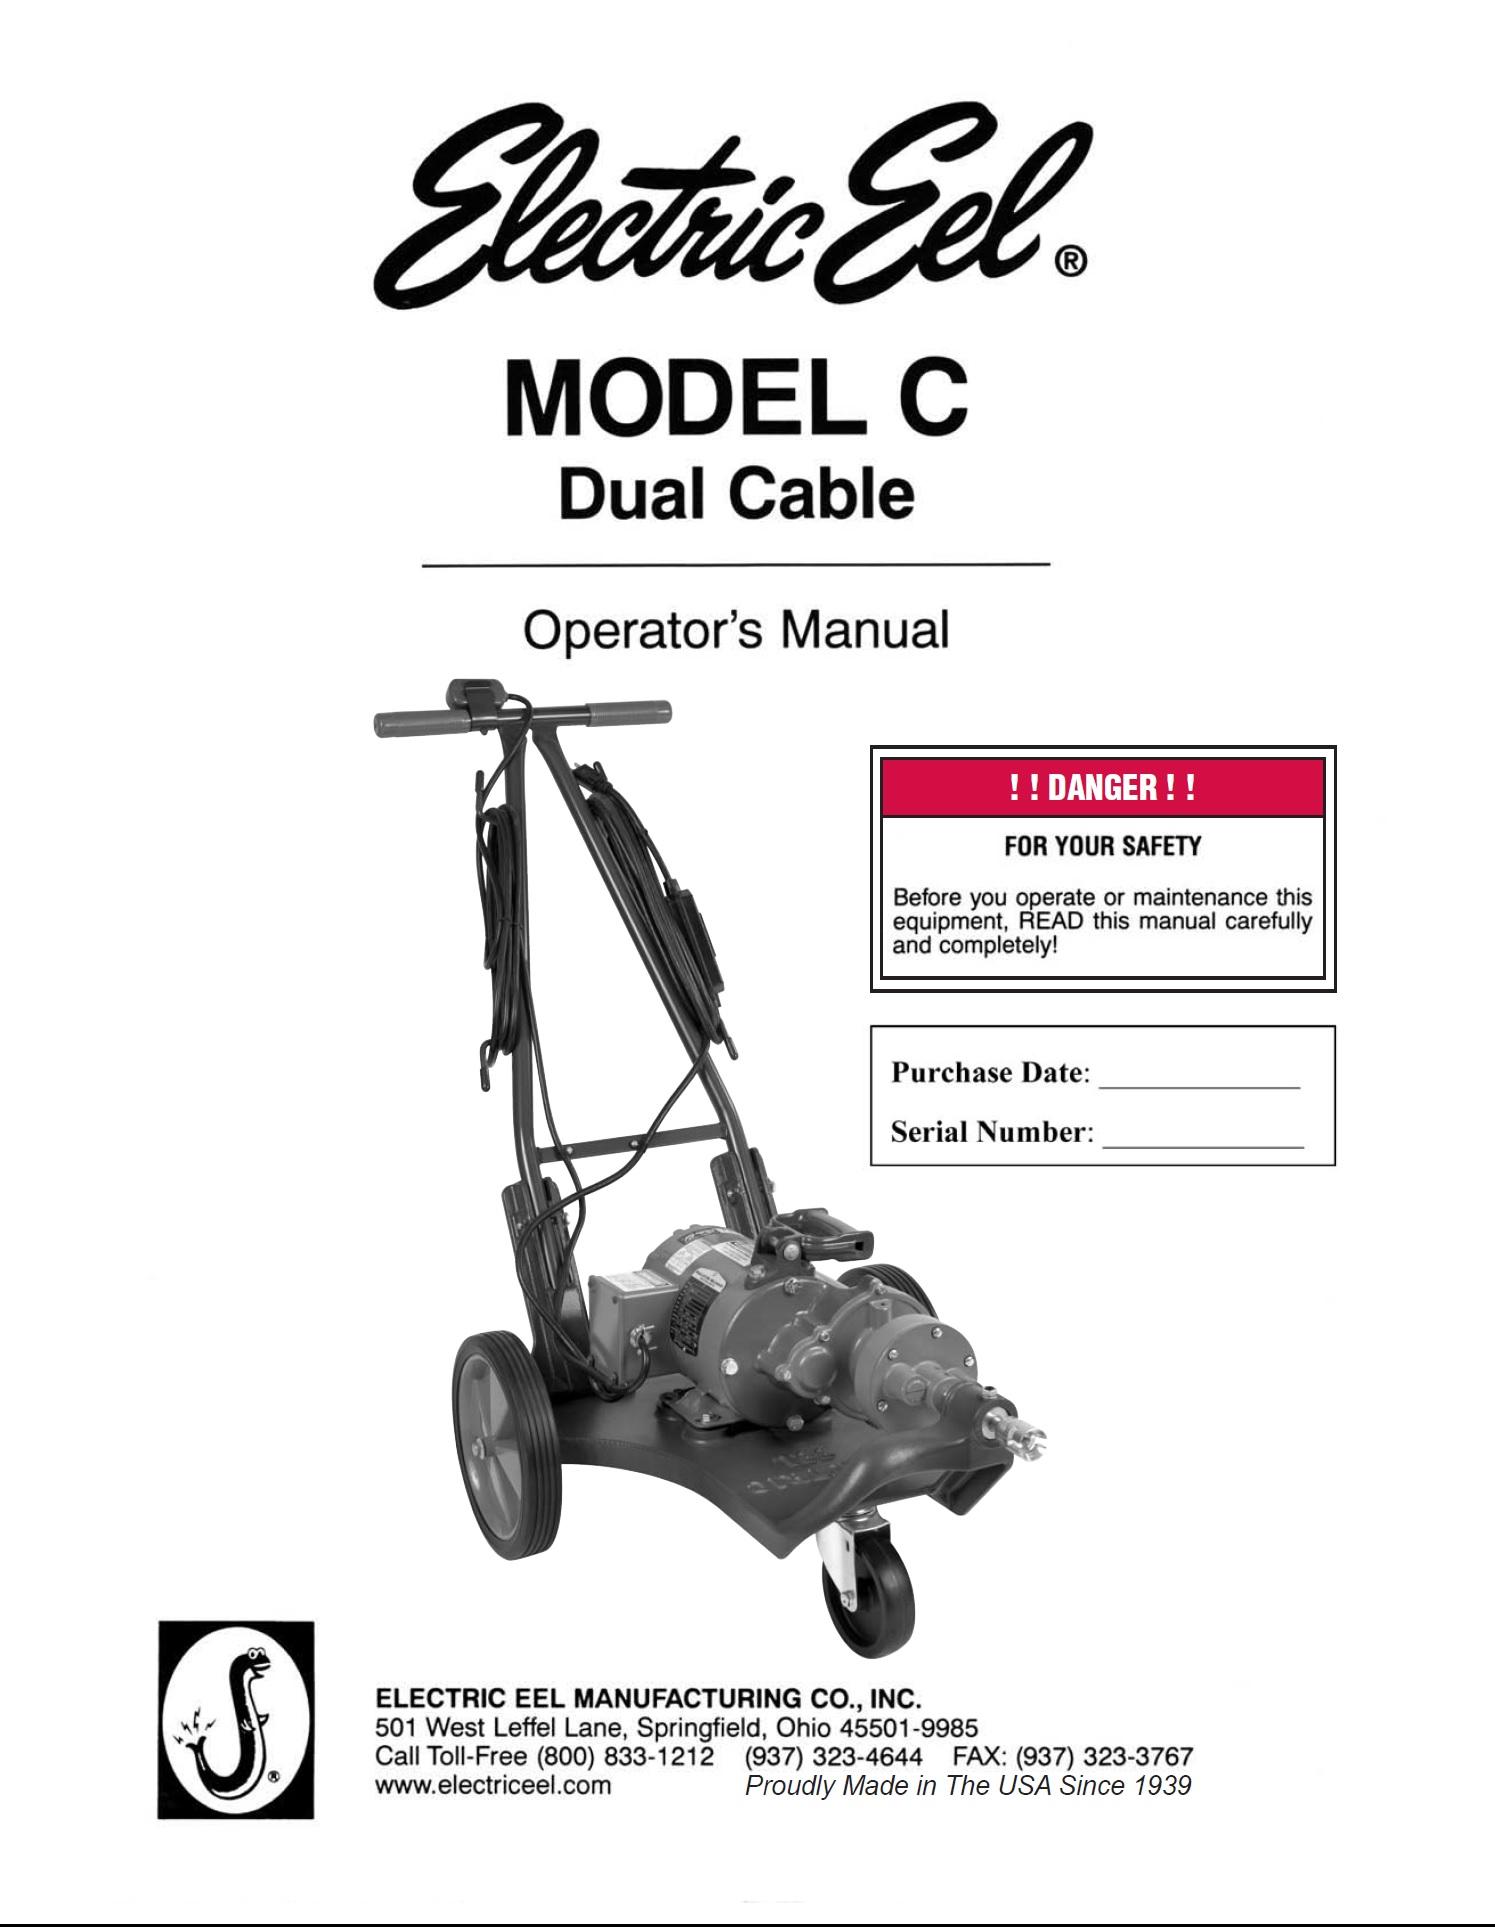 model-c-operating-manual-page-1.jpg